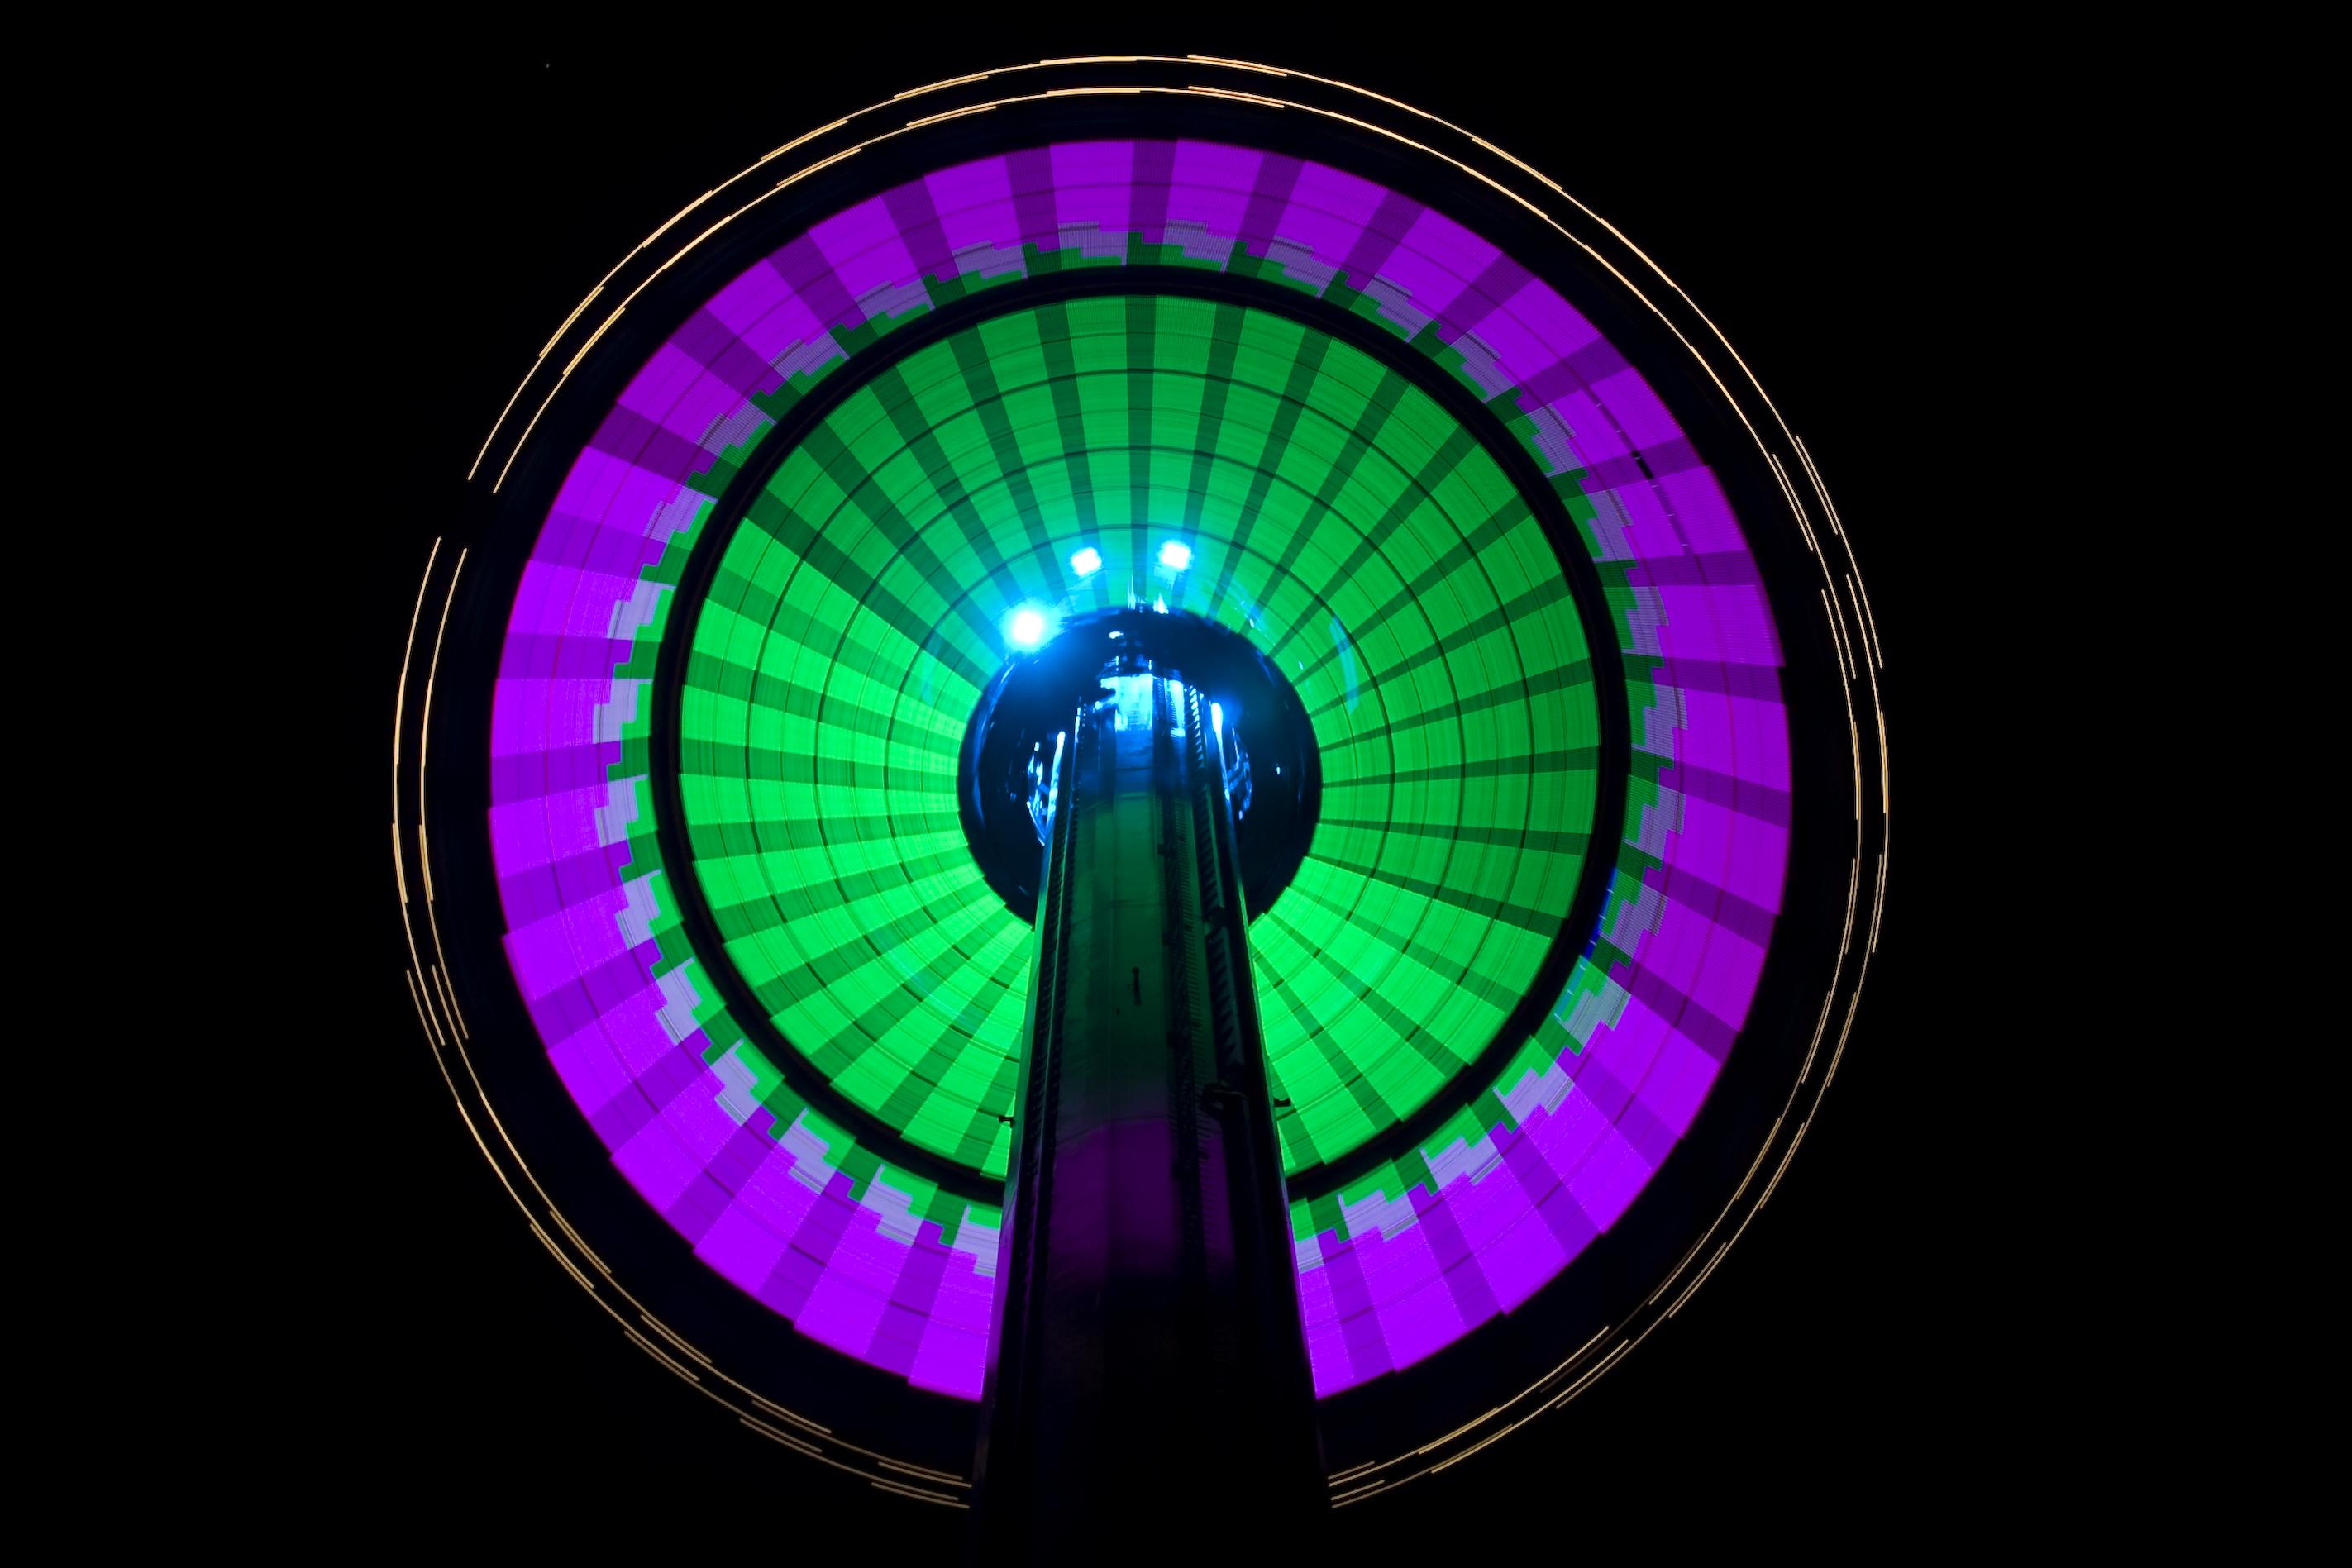 Night light wikipedia - File Windseeker At Night Light Design 3 Jpg